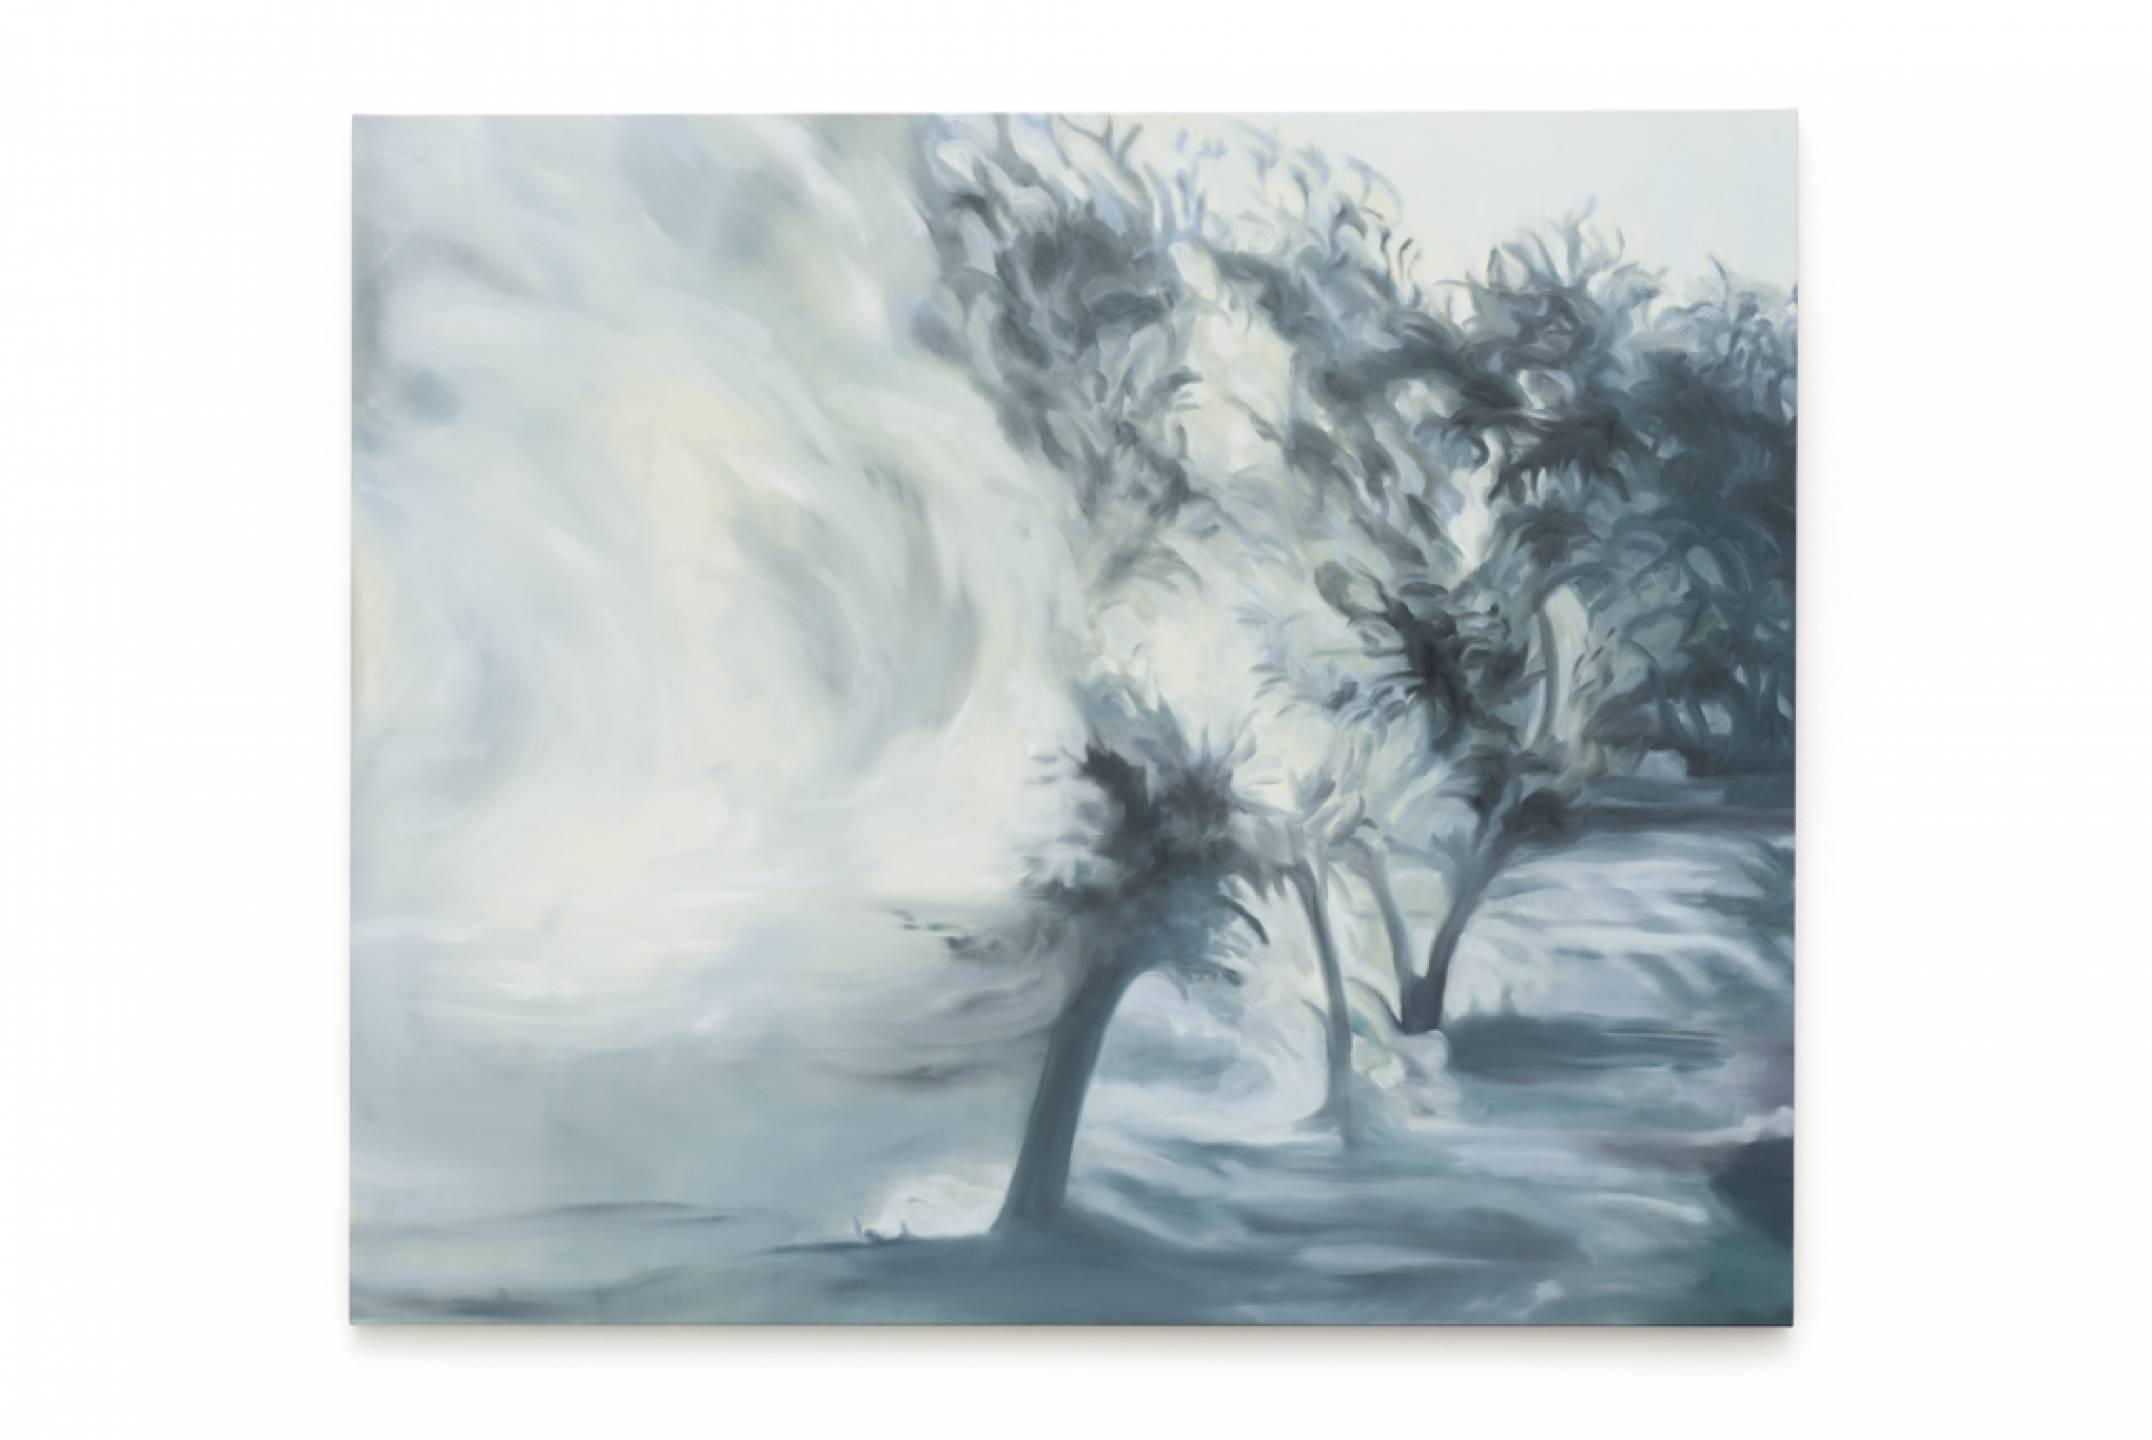 Marina Perez Simão,&nbsp;<em>untitled</em>,&nbsp;2017,&nbsp;oil on canvas, 130 × 155 cm - Mendes Wood DM